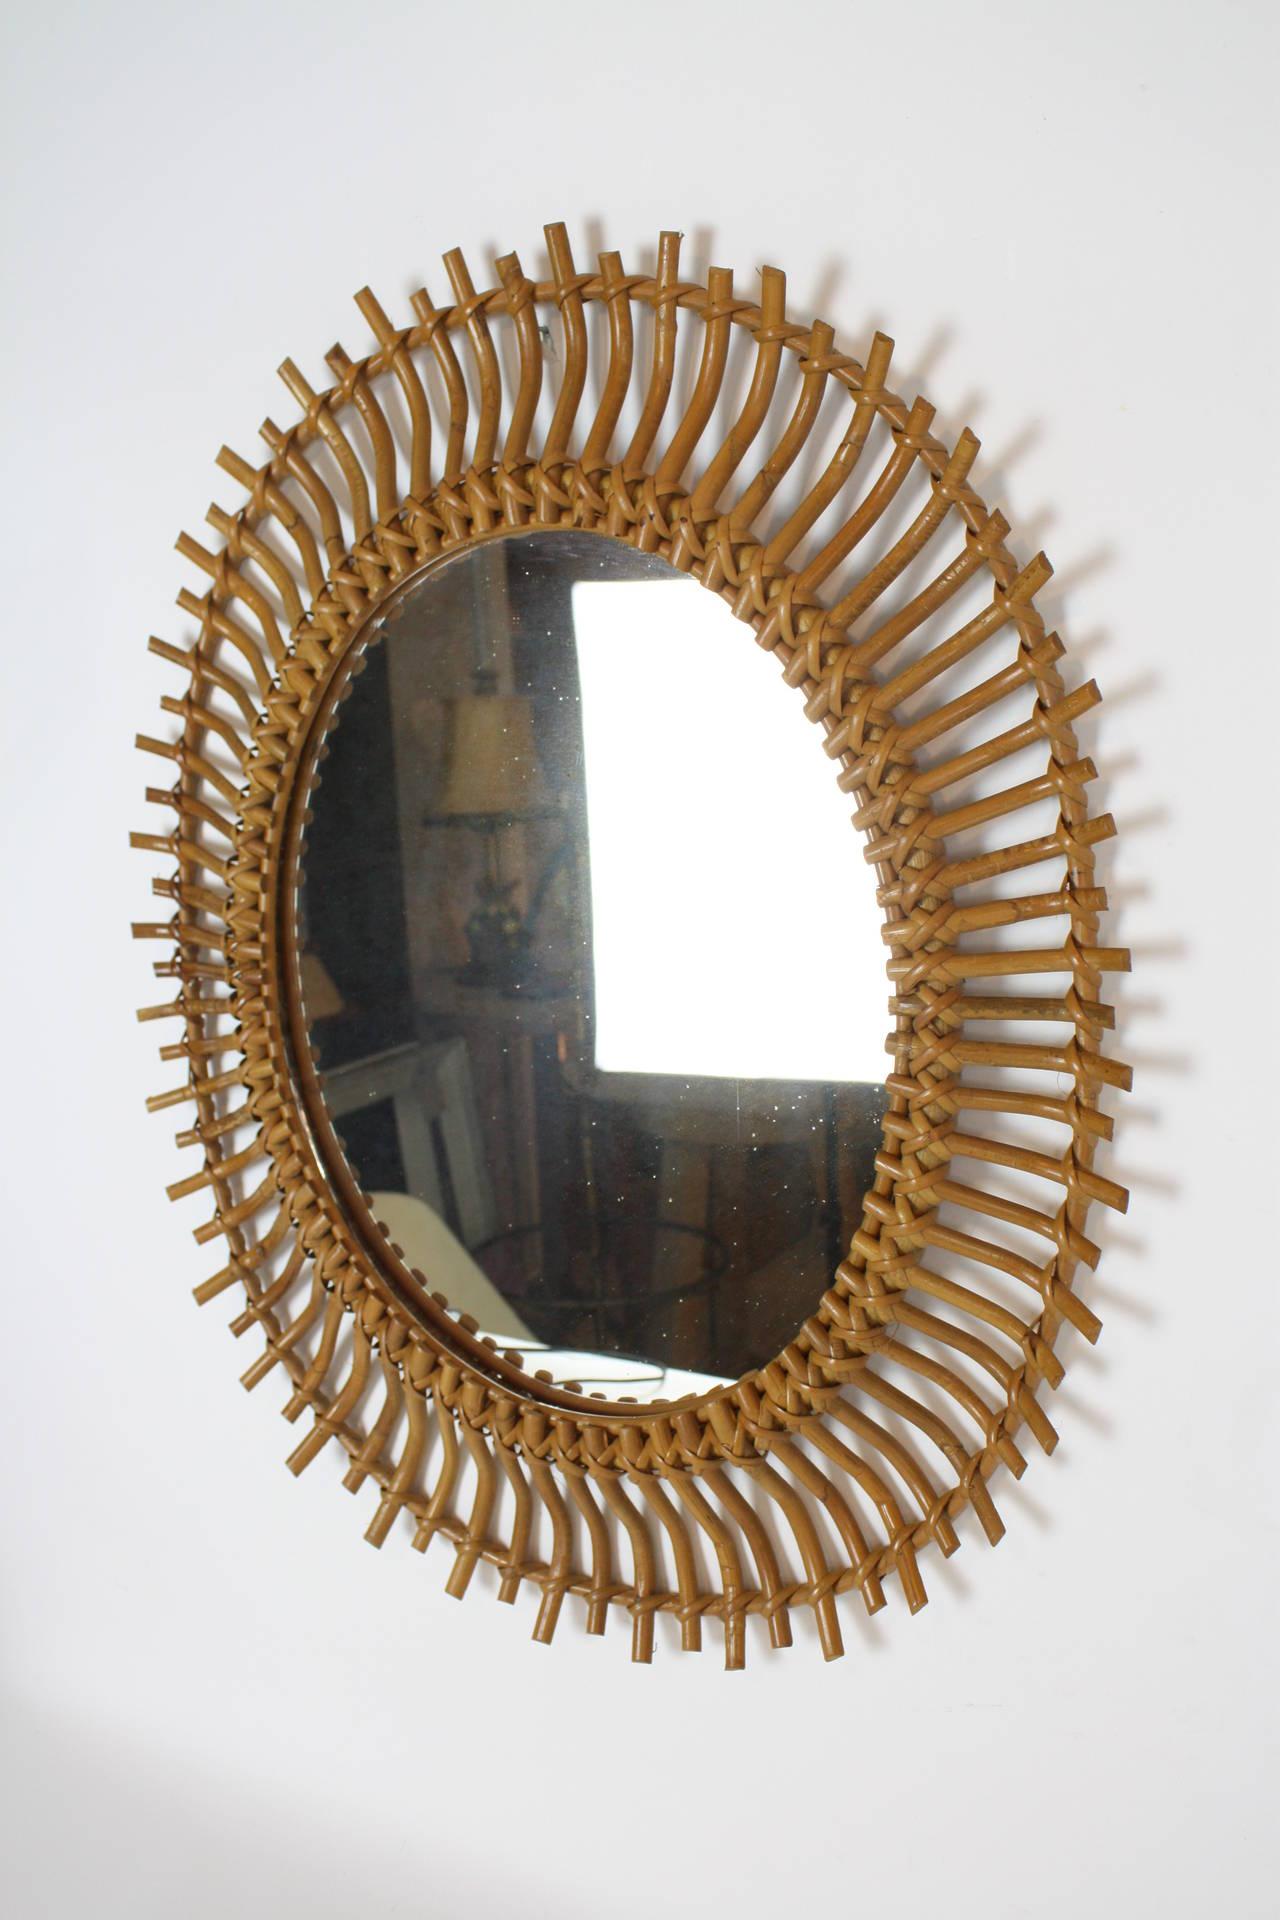 Bamboo and rattan sunburst oval mirror at 1stdibs for Sunburst mirror